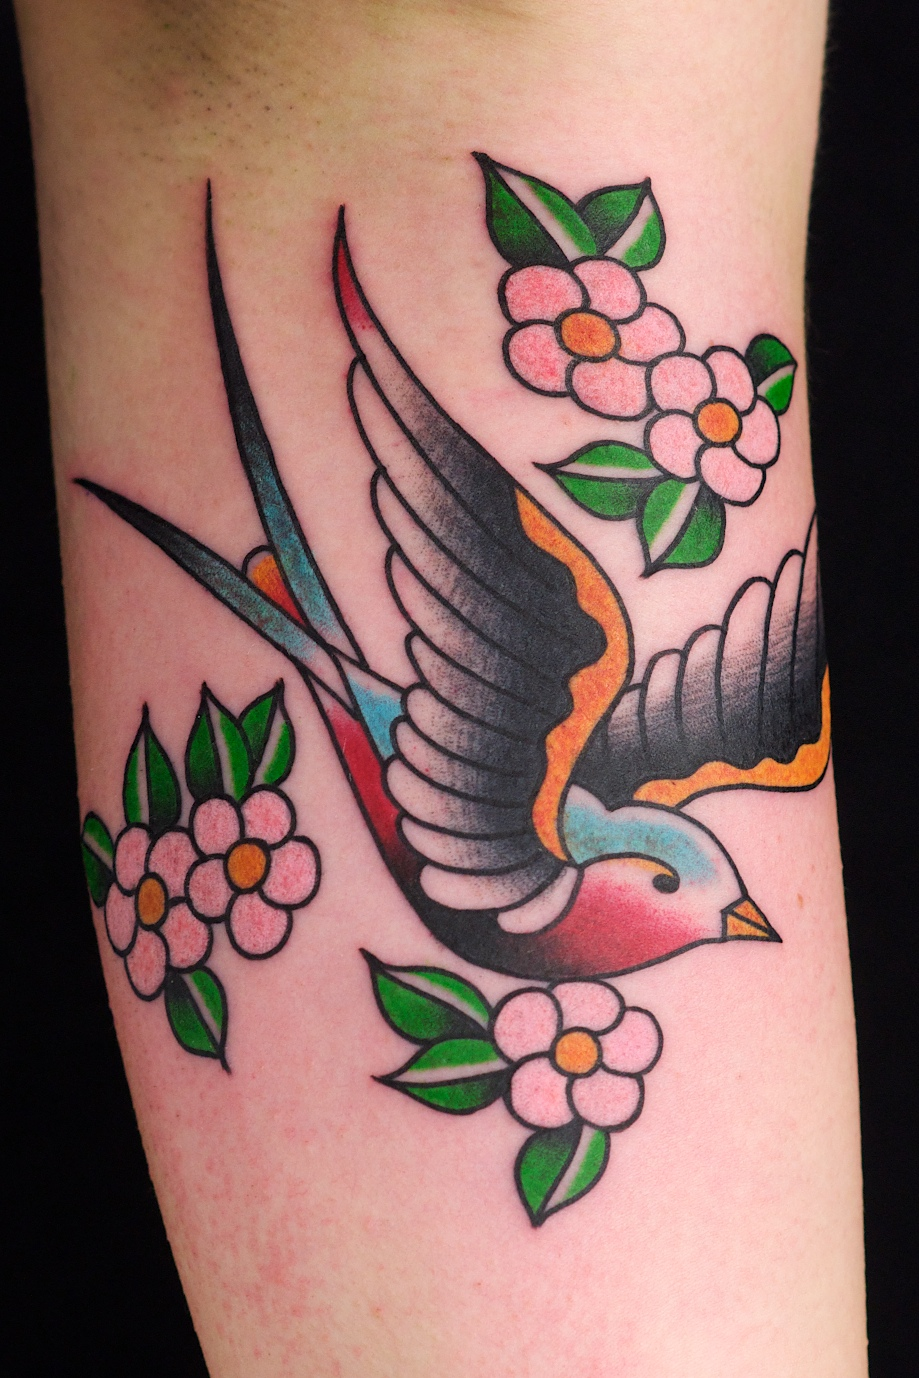 01062013 Tattoos 15 14.jpg